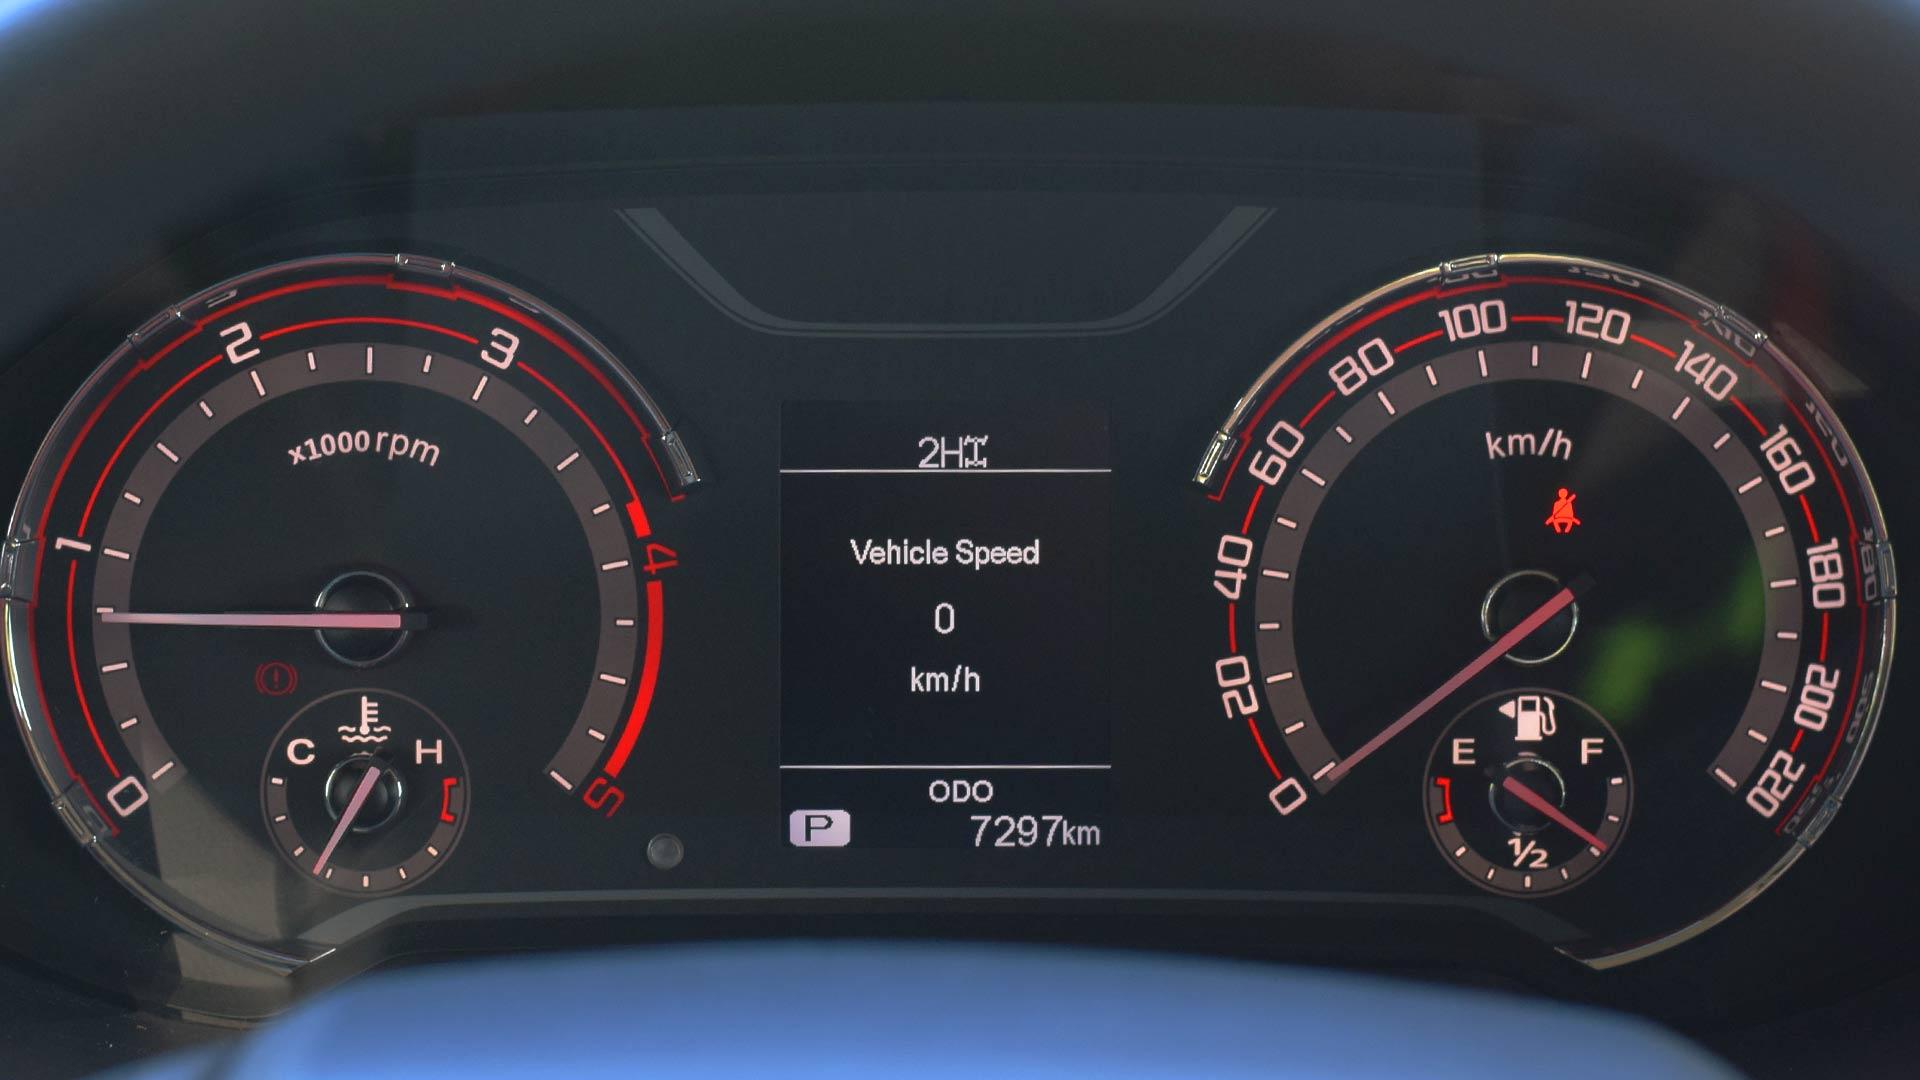 The Maxus T60 odometer